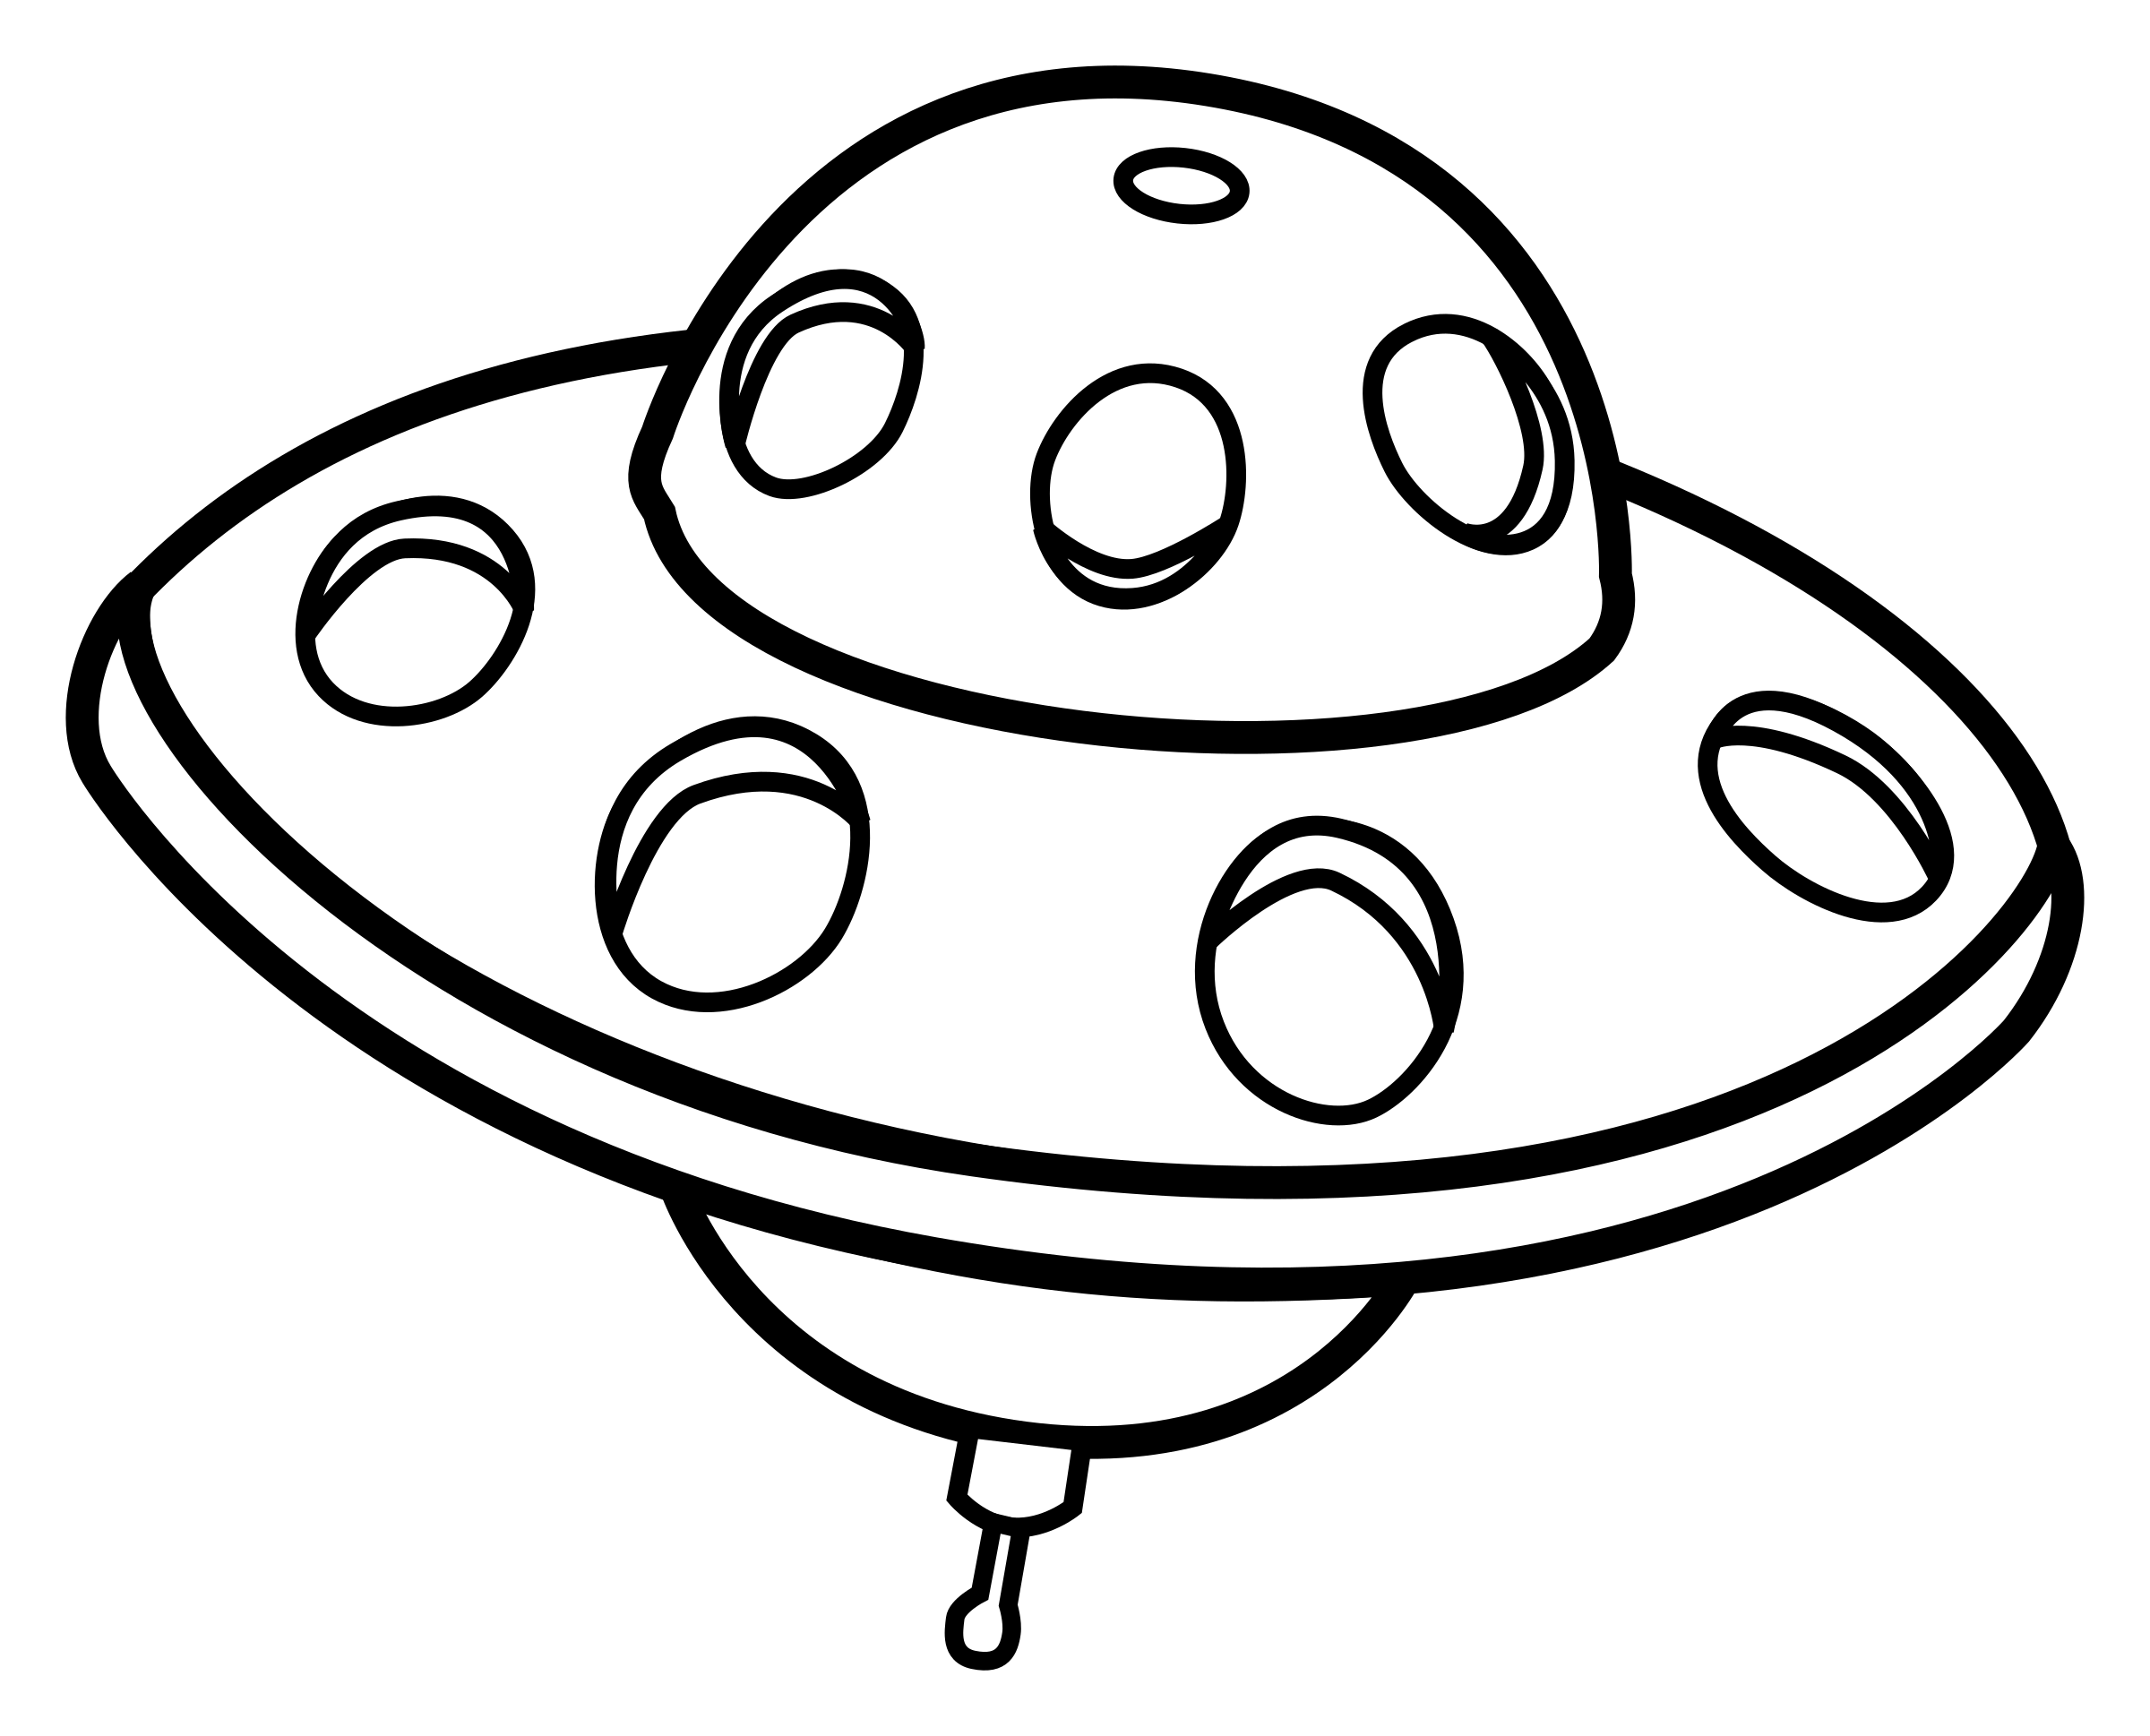 ufo clipart line art